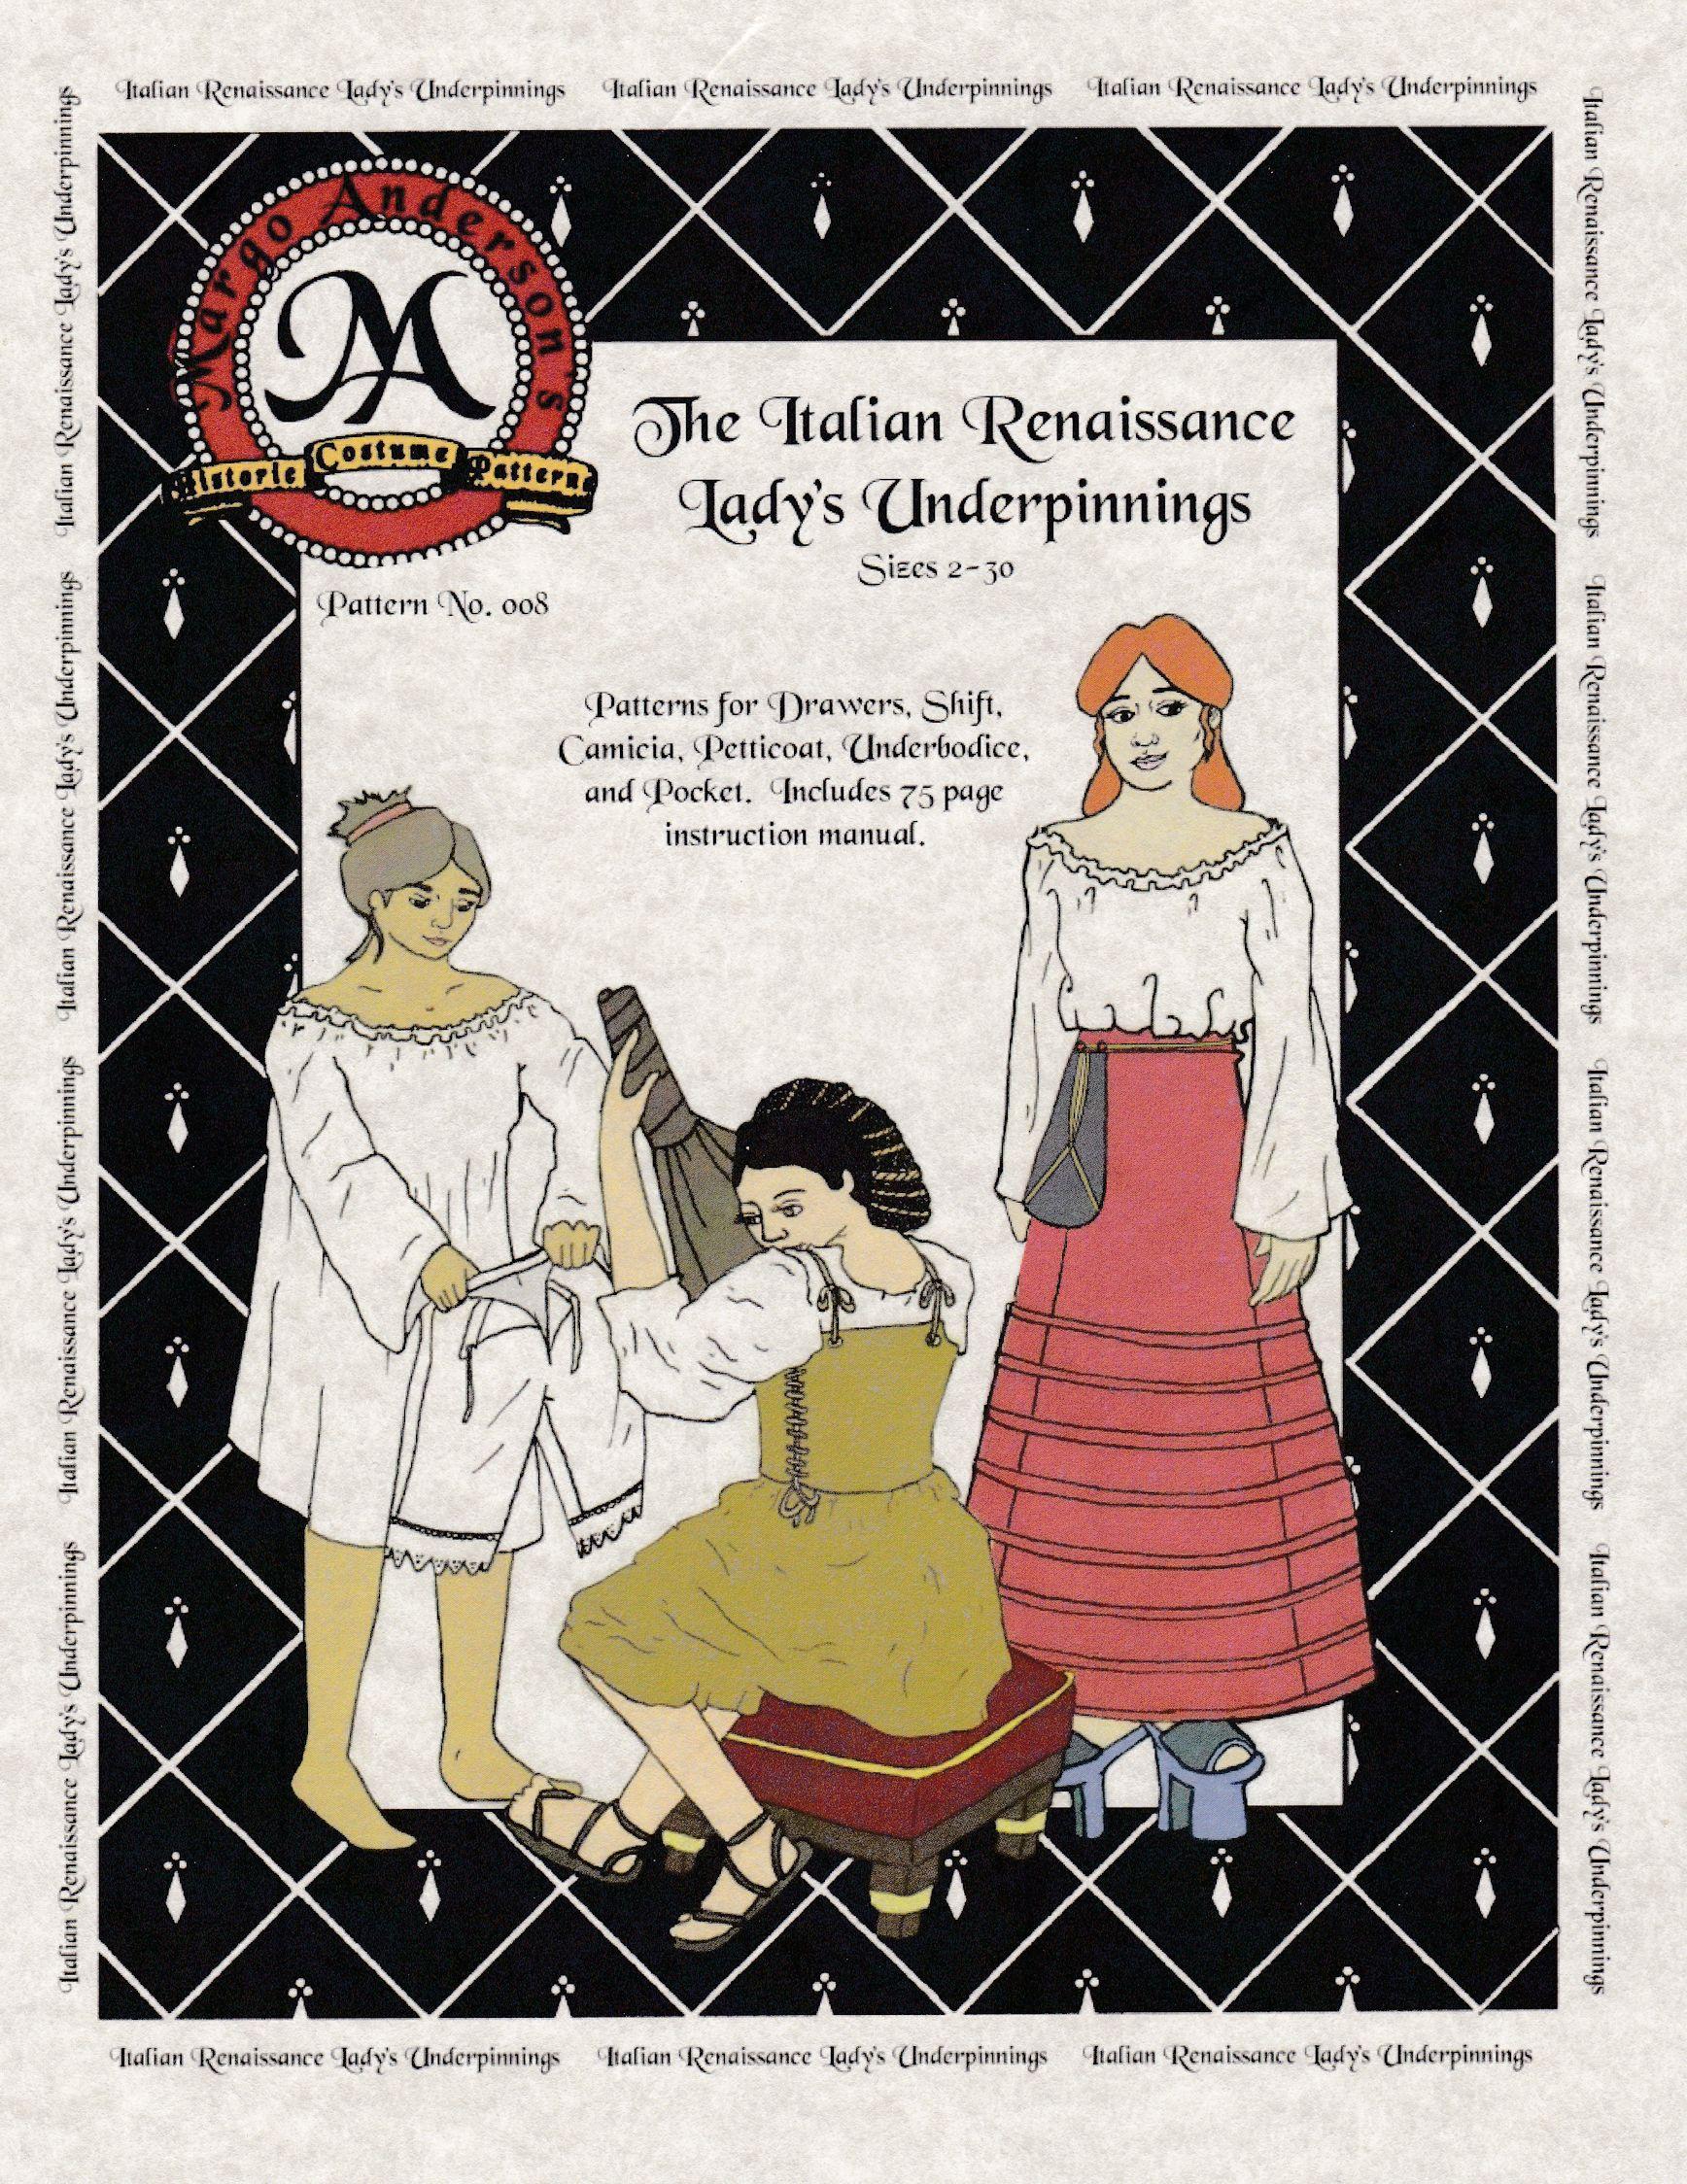 Italienische Renaissance Unterkleidung (MA008) – Nehelenia Patterns